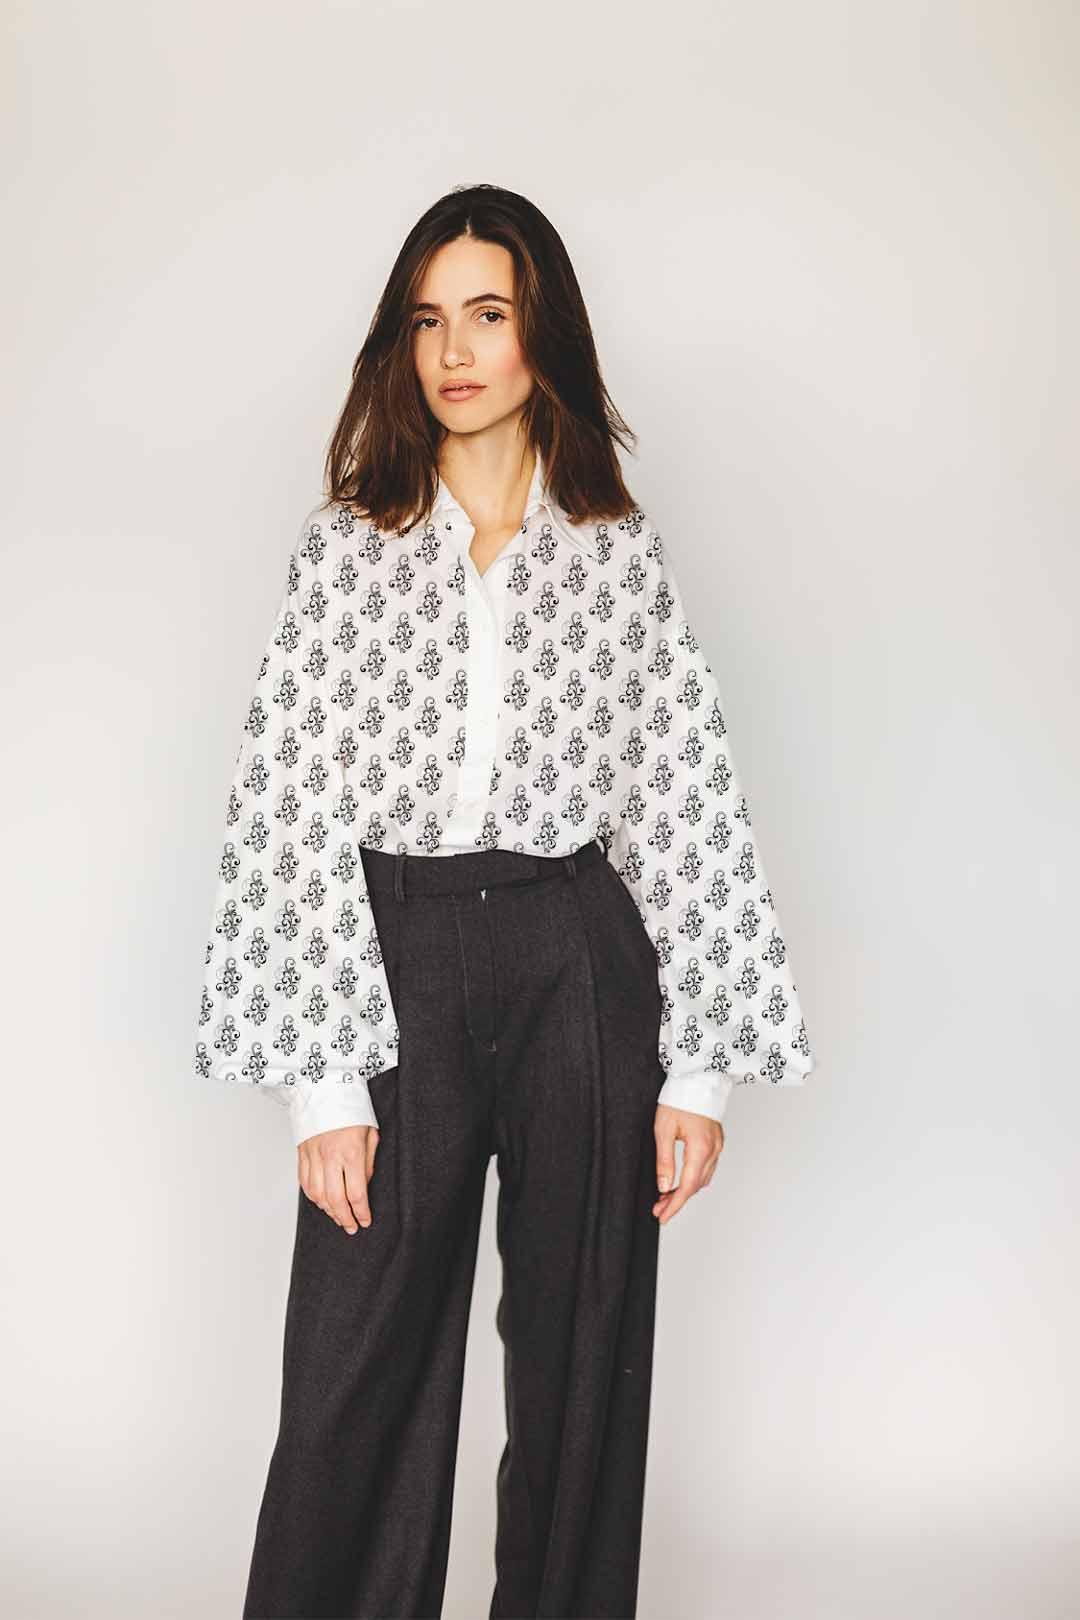 Georgette Shirt Top – Classic